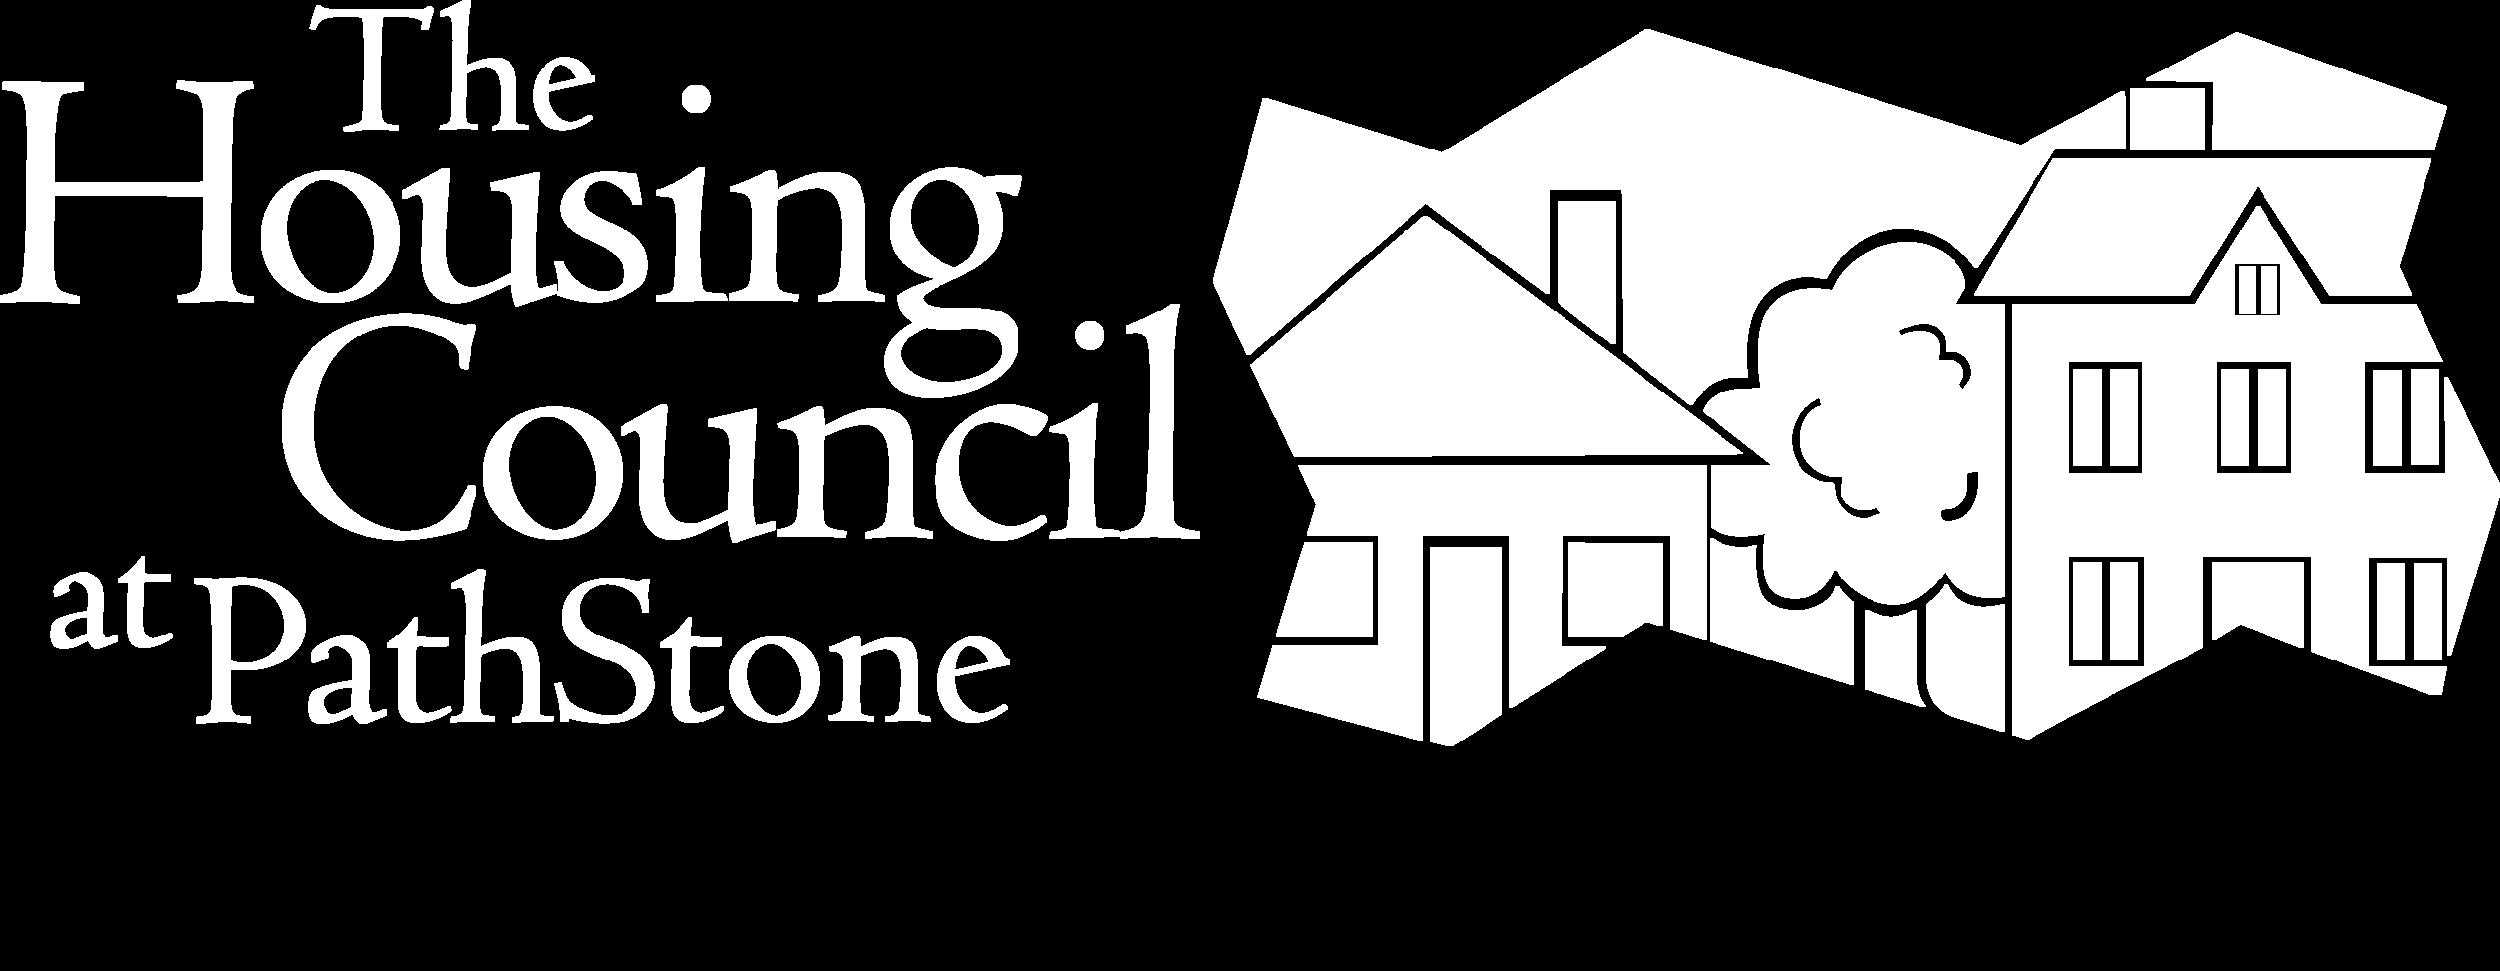 HCPS_logo_2019_cmyk_wt.png